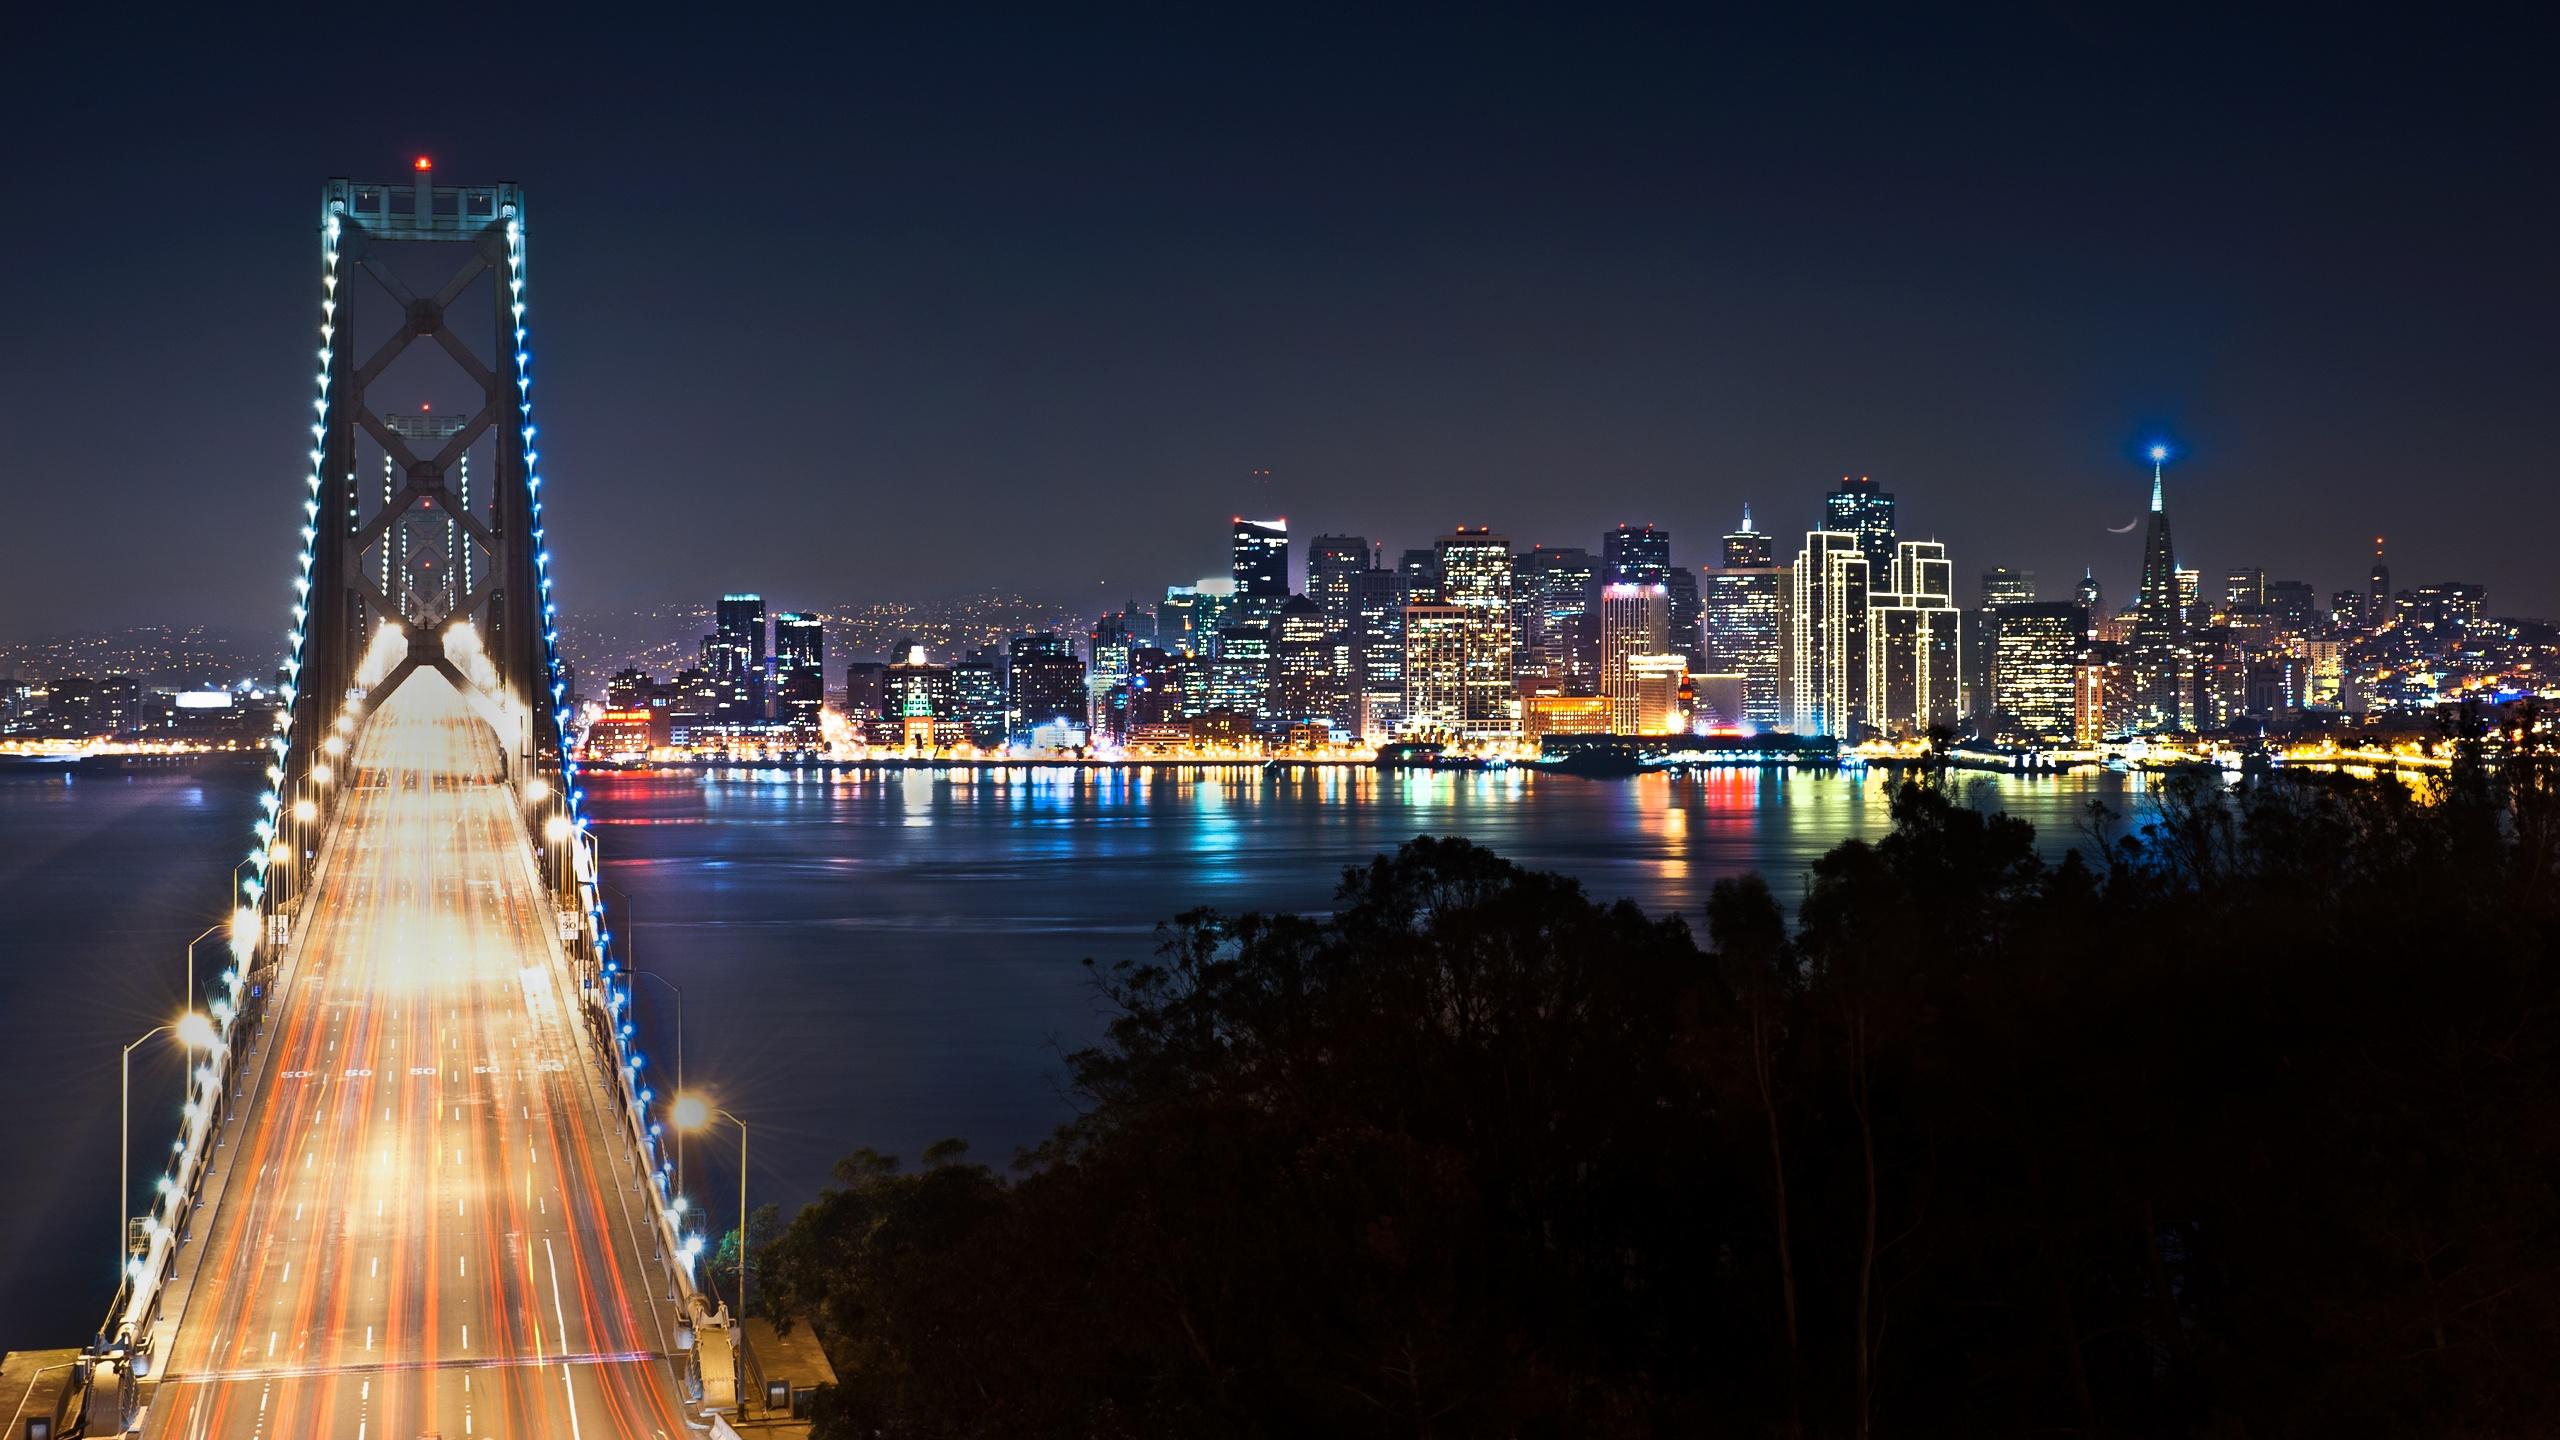 san francisco at night cityscape wallpaper Desktop 2560x1440